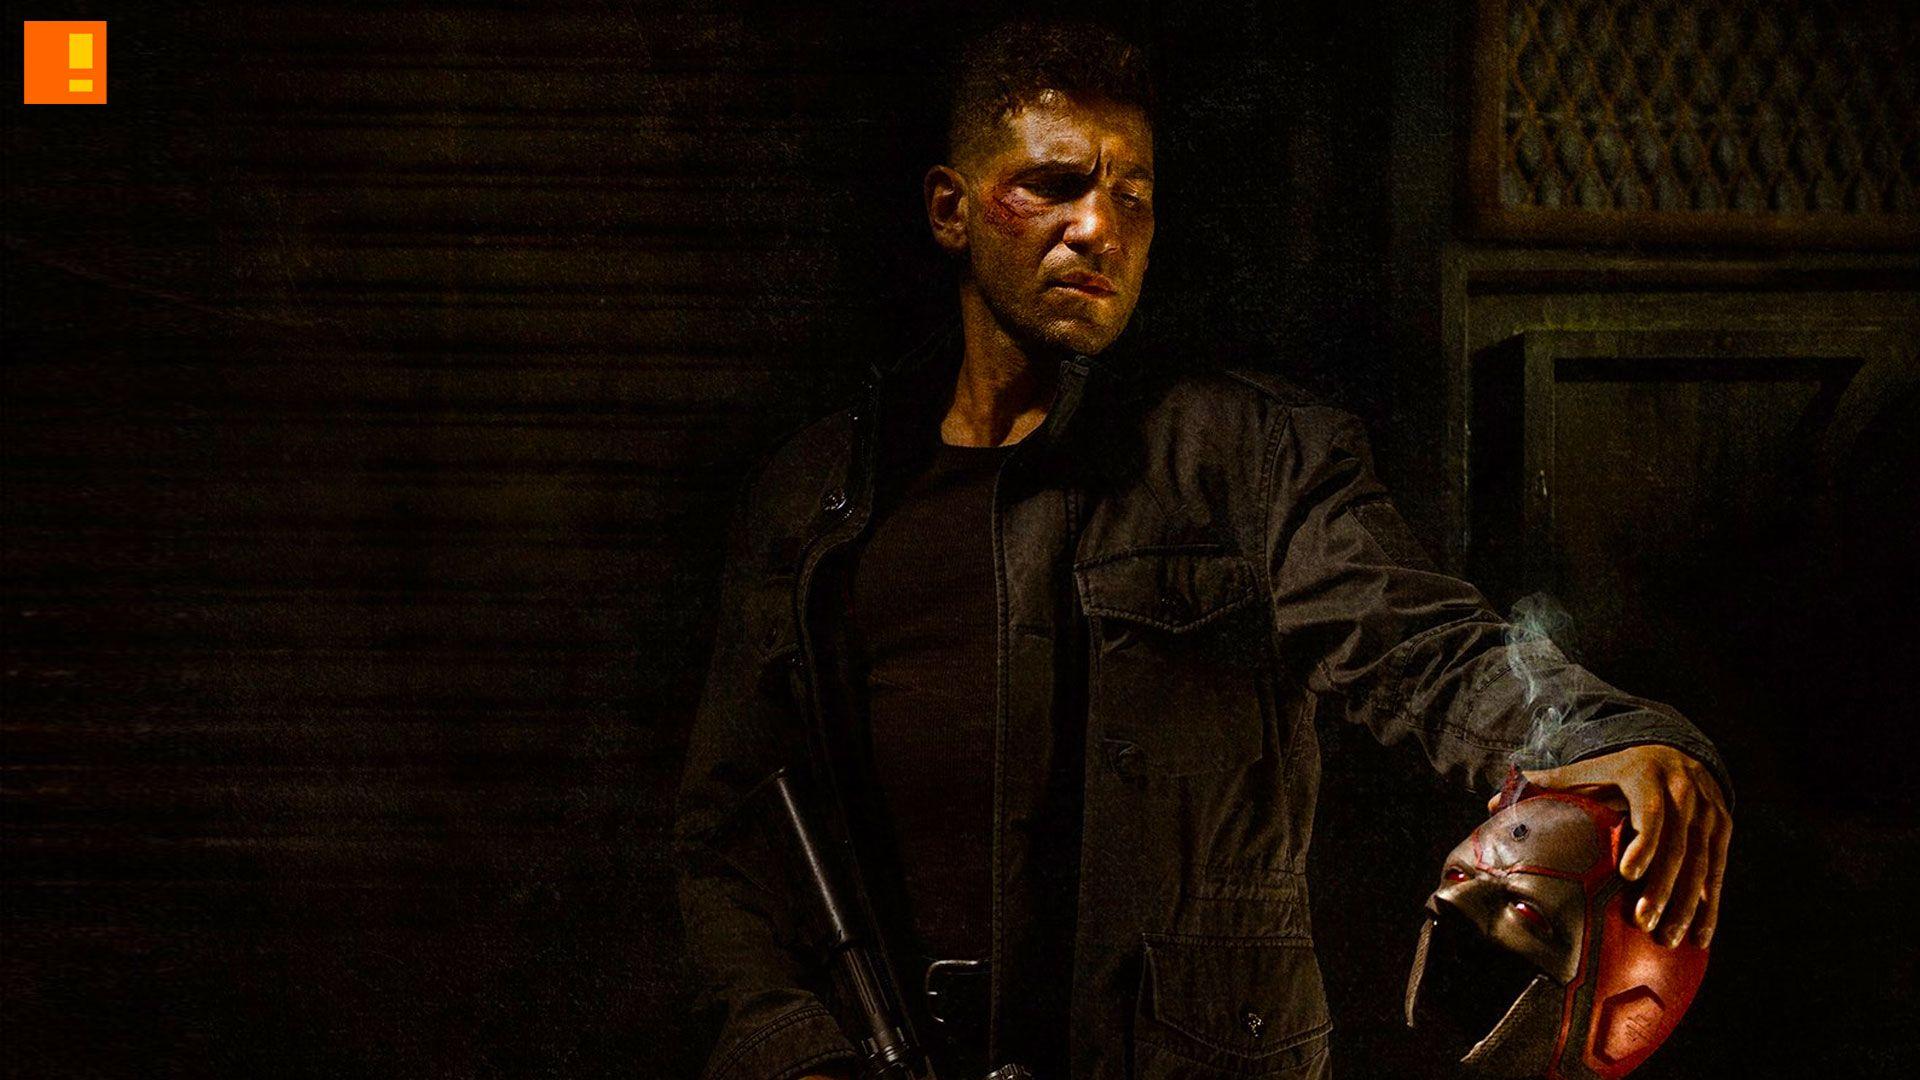 Marvel The Punisher Hd Wallpaper Punisher Netflix Jon Bernthal